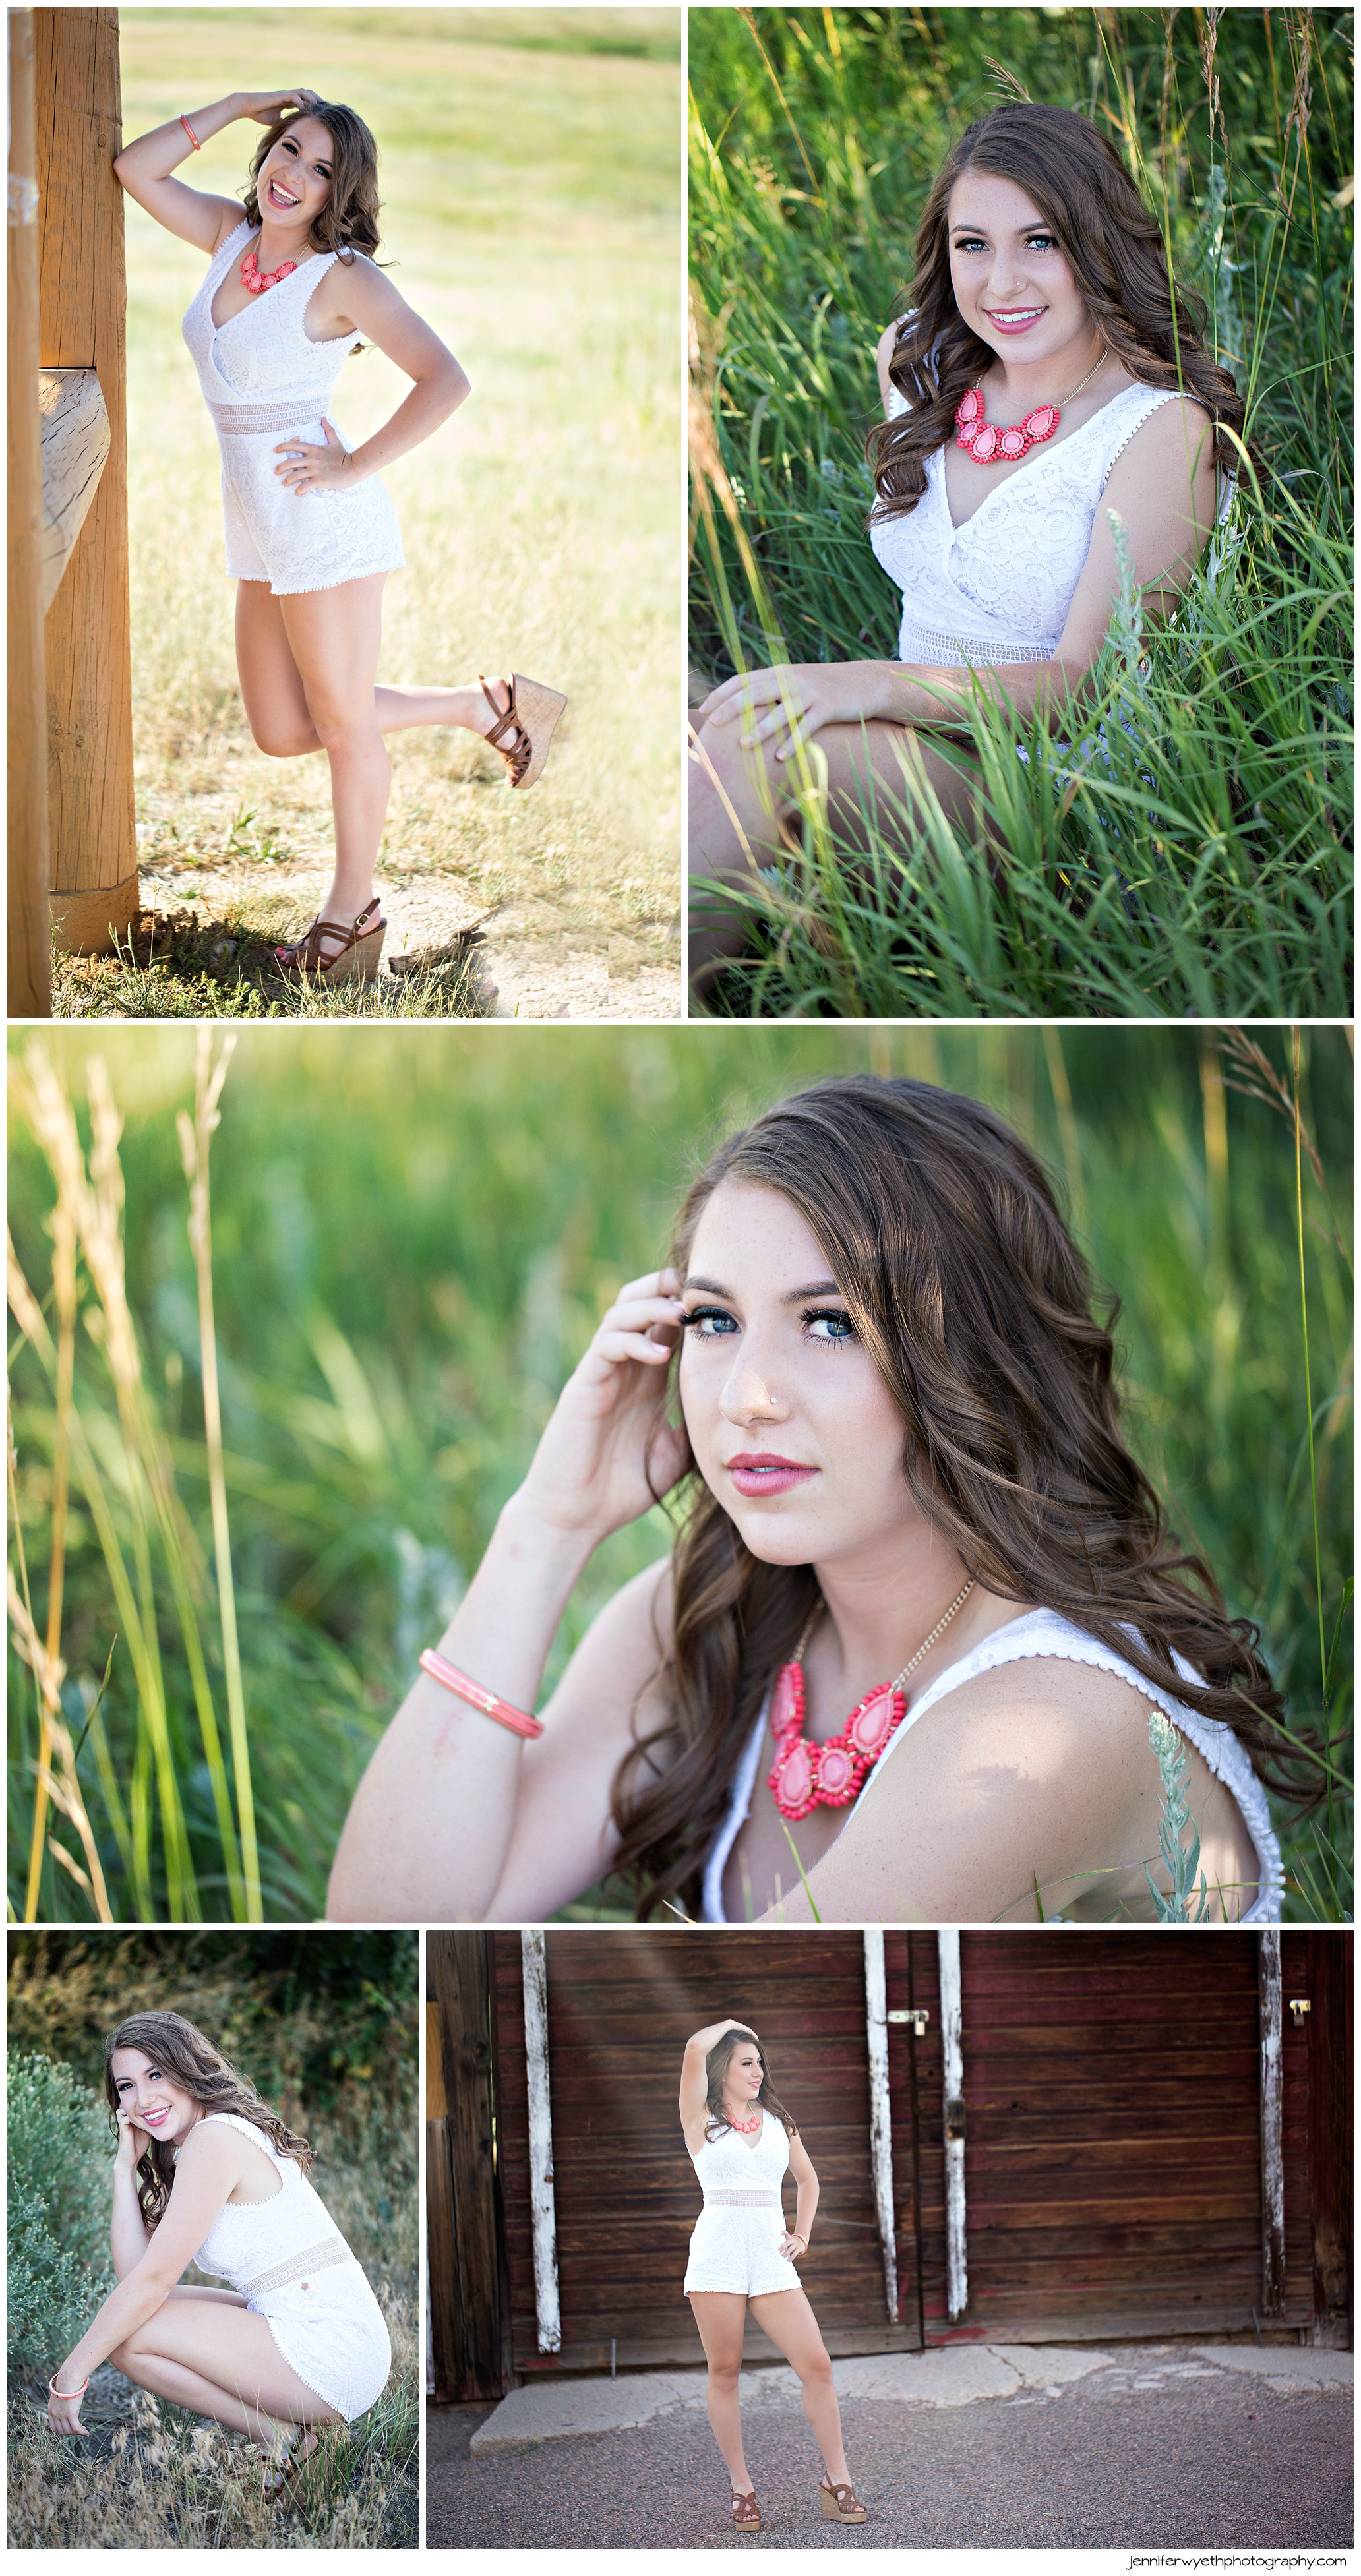 Jennifer-Wyeth-photography-senior-pictures-colorado-springs-photographer_0190.jpg